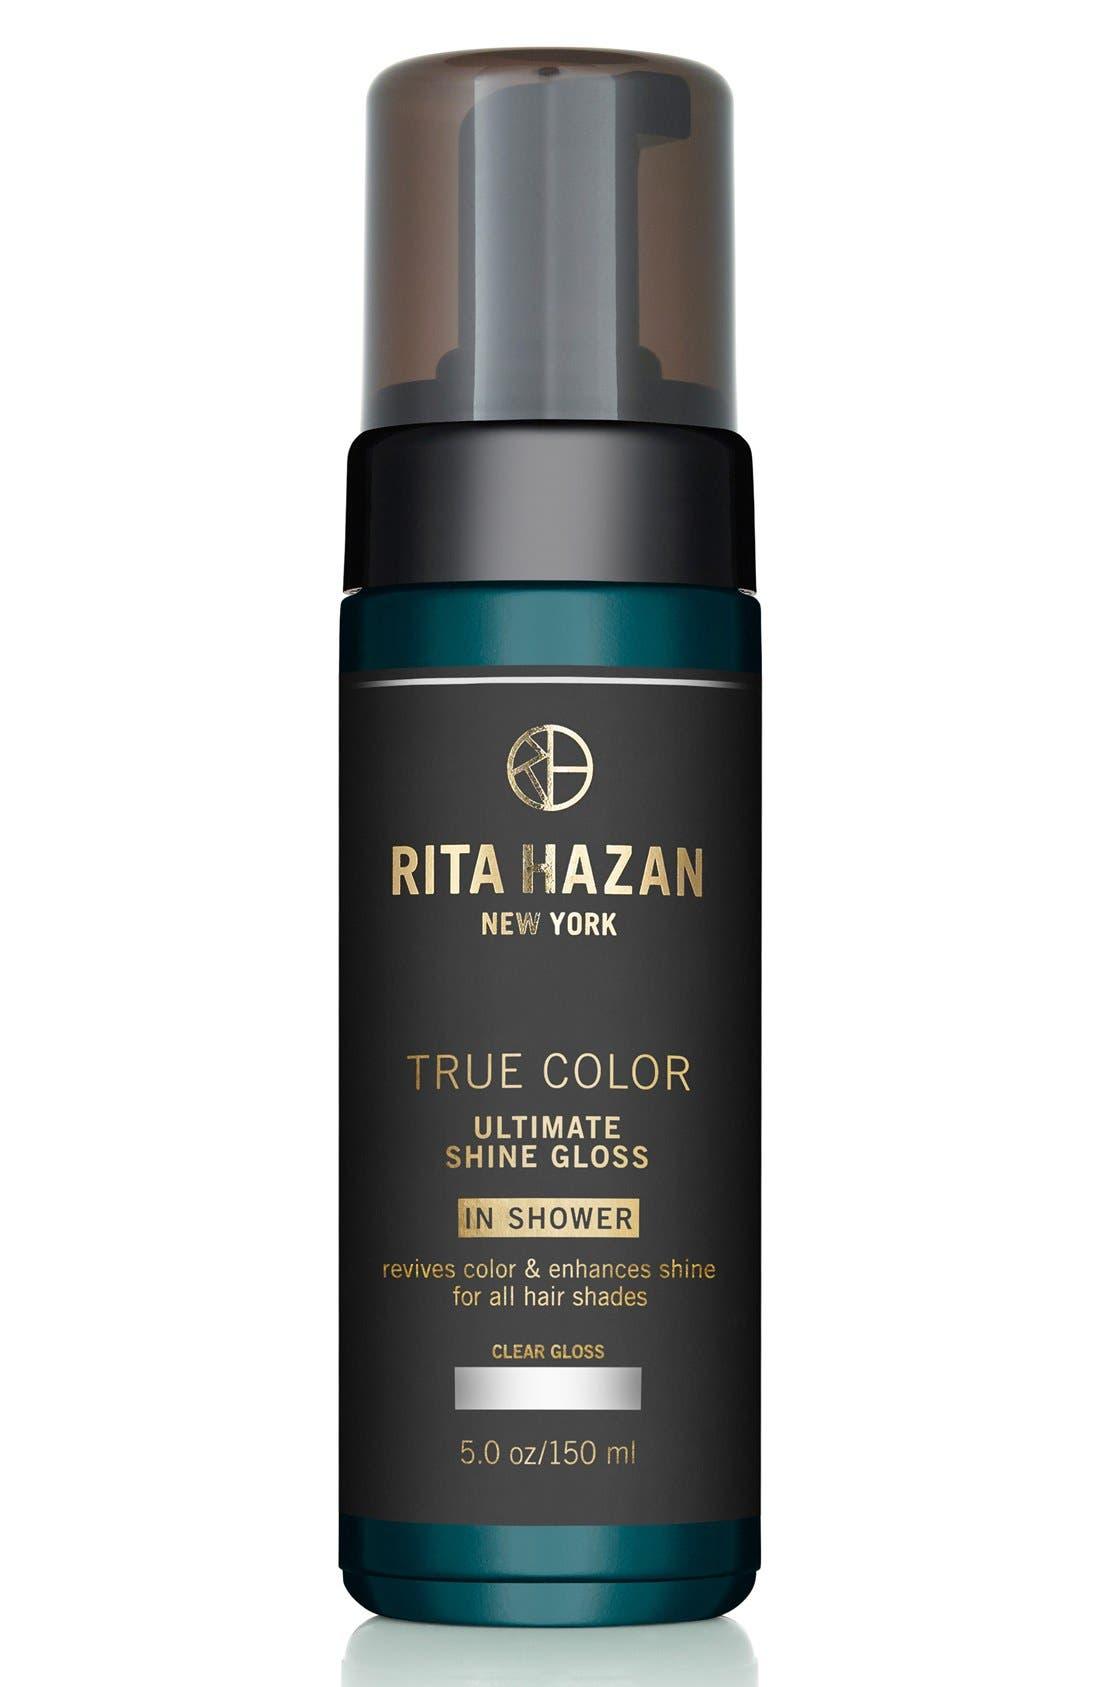 'True Color' Ultimate Shine Gloss,                         Main,                         color, CLEAR